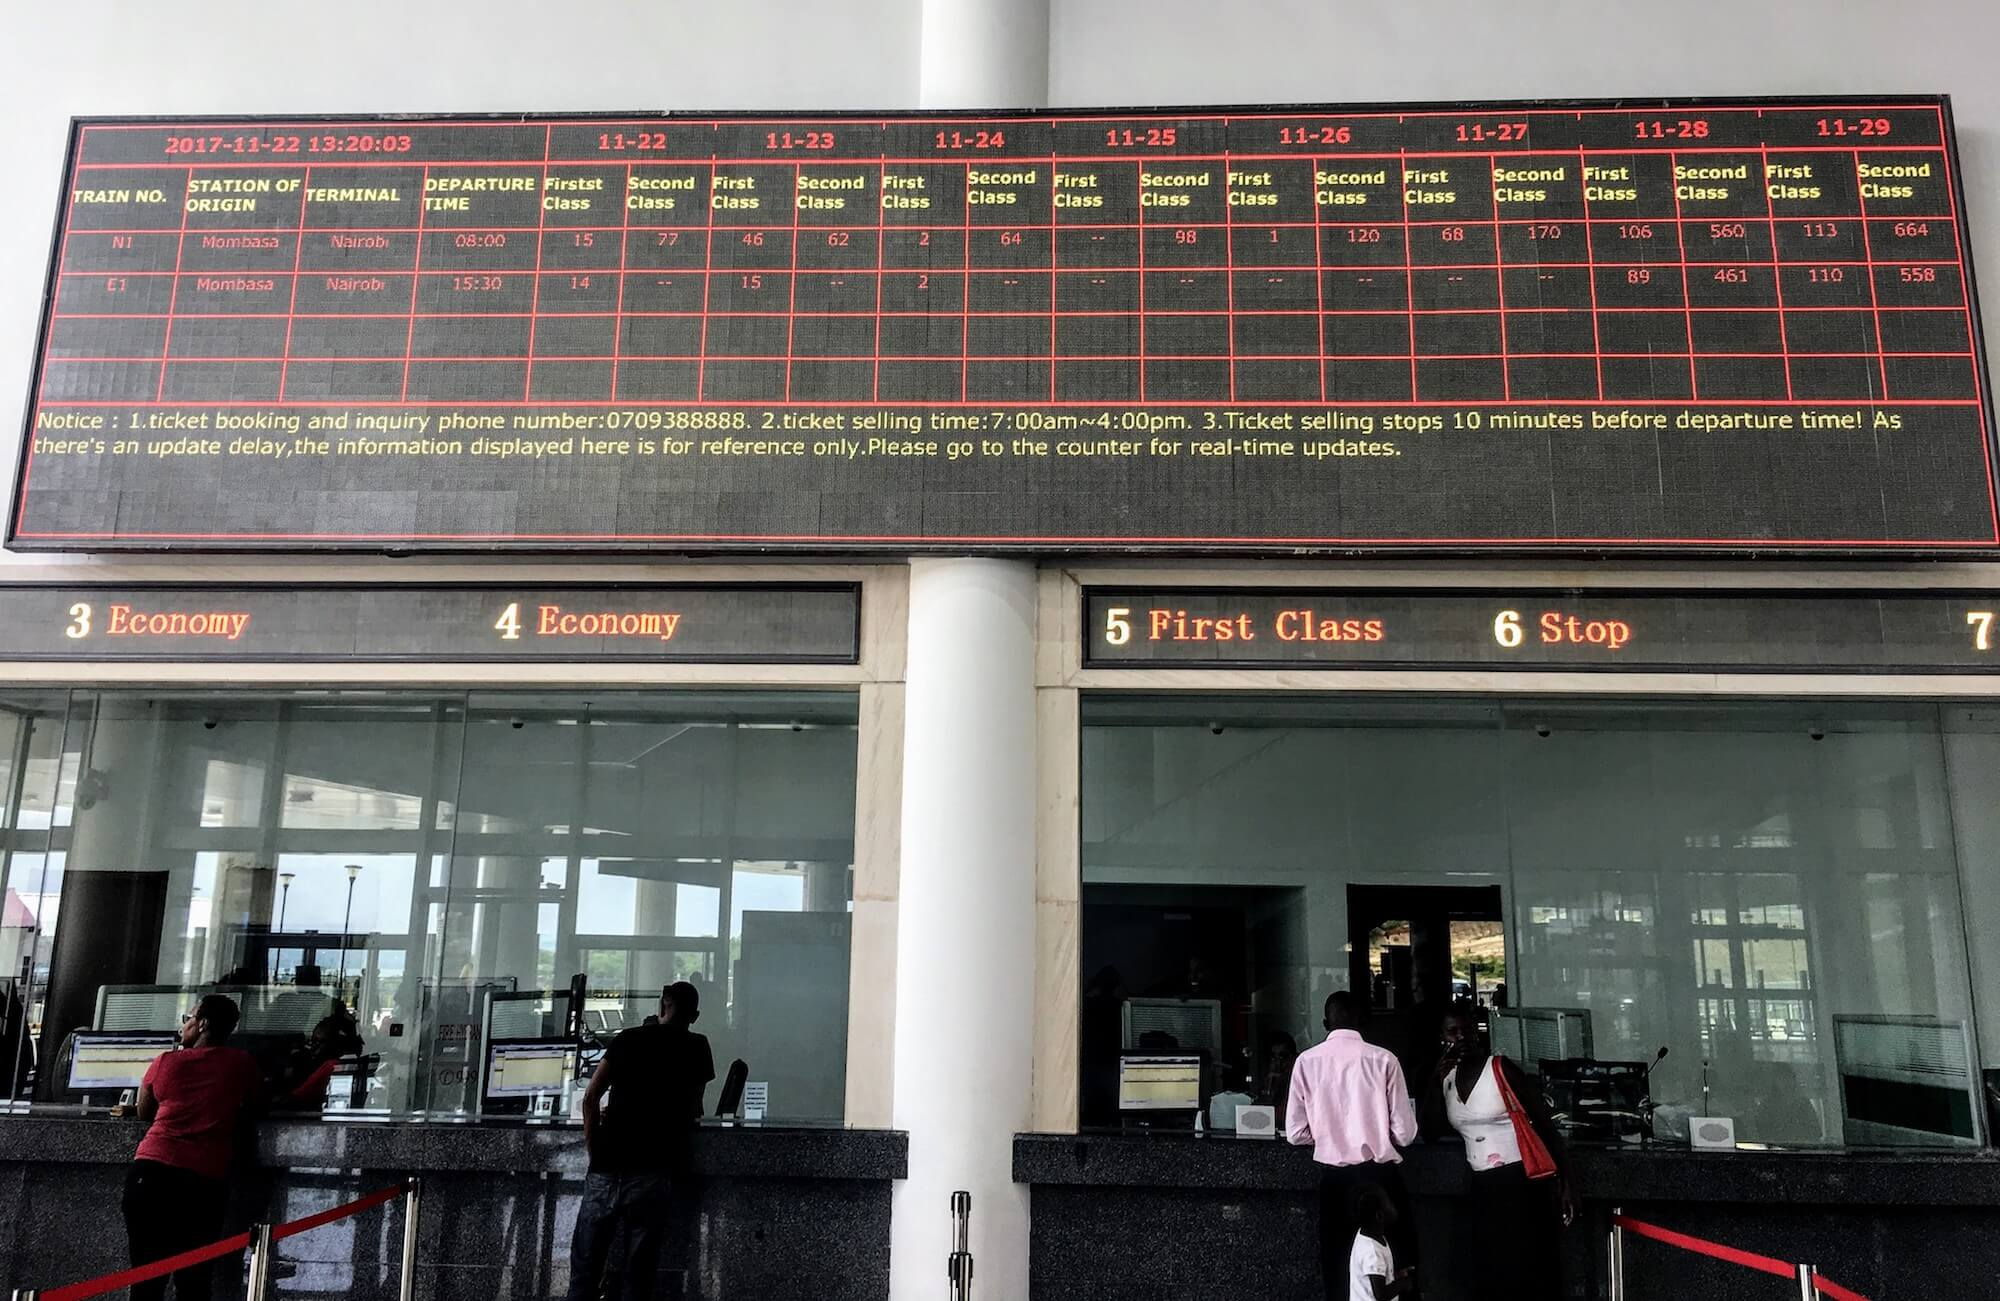 mombassa train station ticket availability